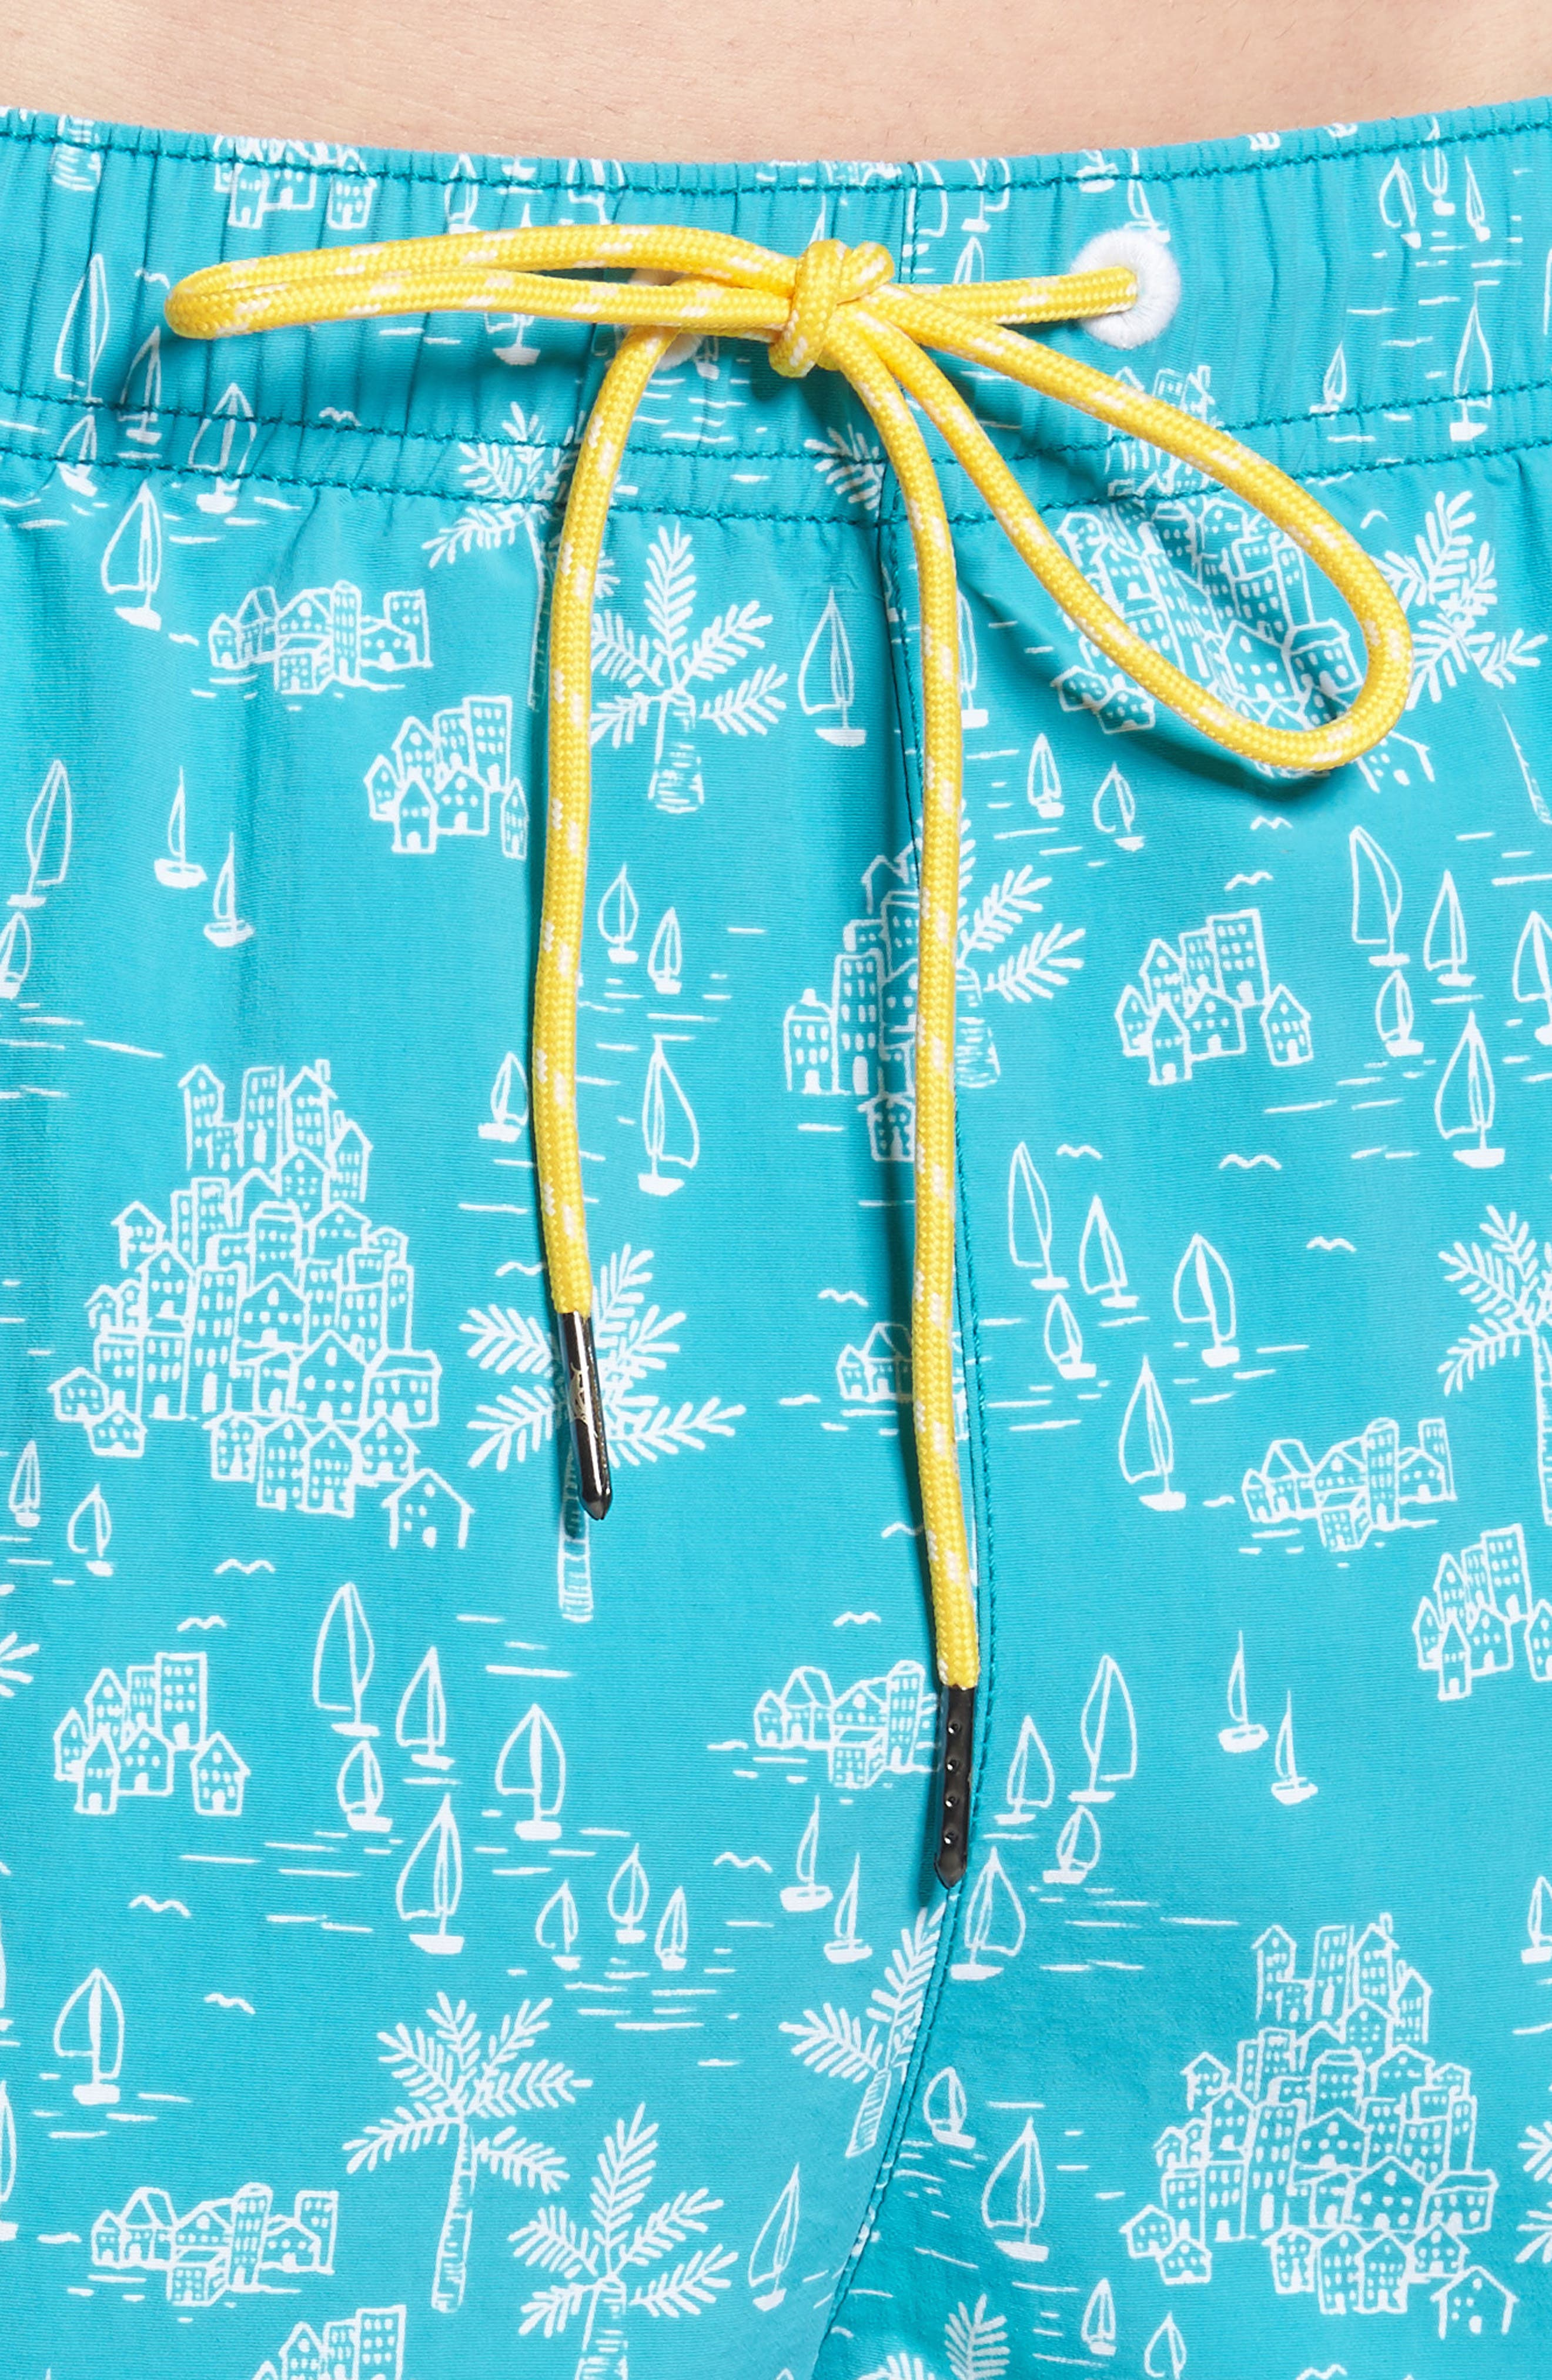 Naples Santorini Sails Swim Trunks,                             Alternate thumbnail 4, color,                             400